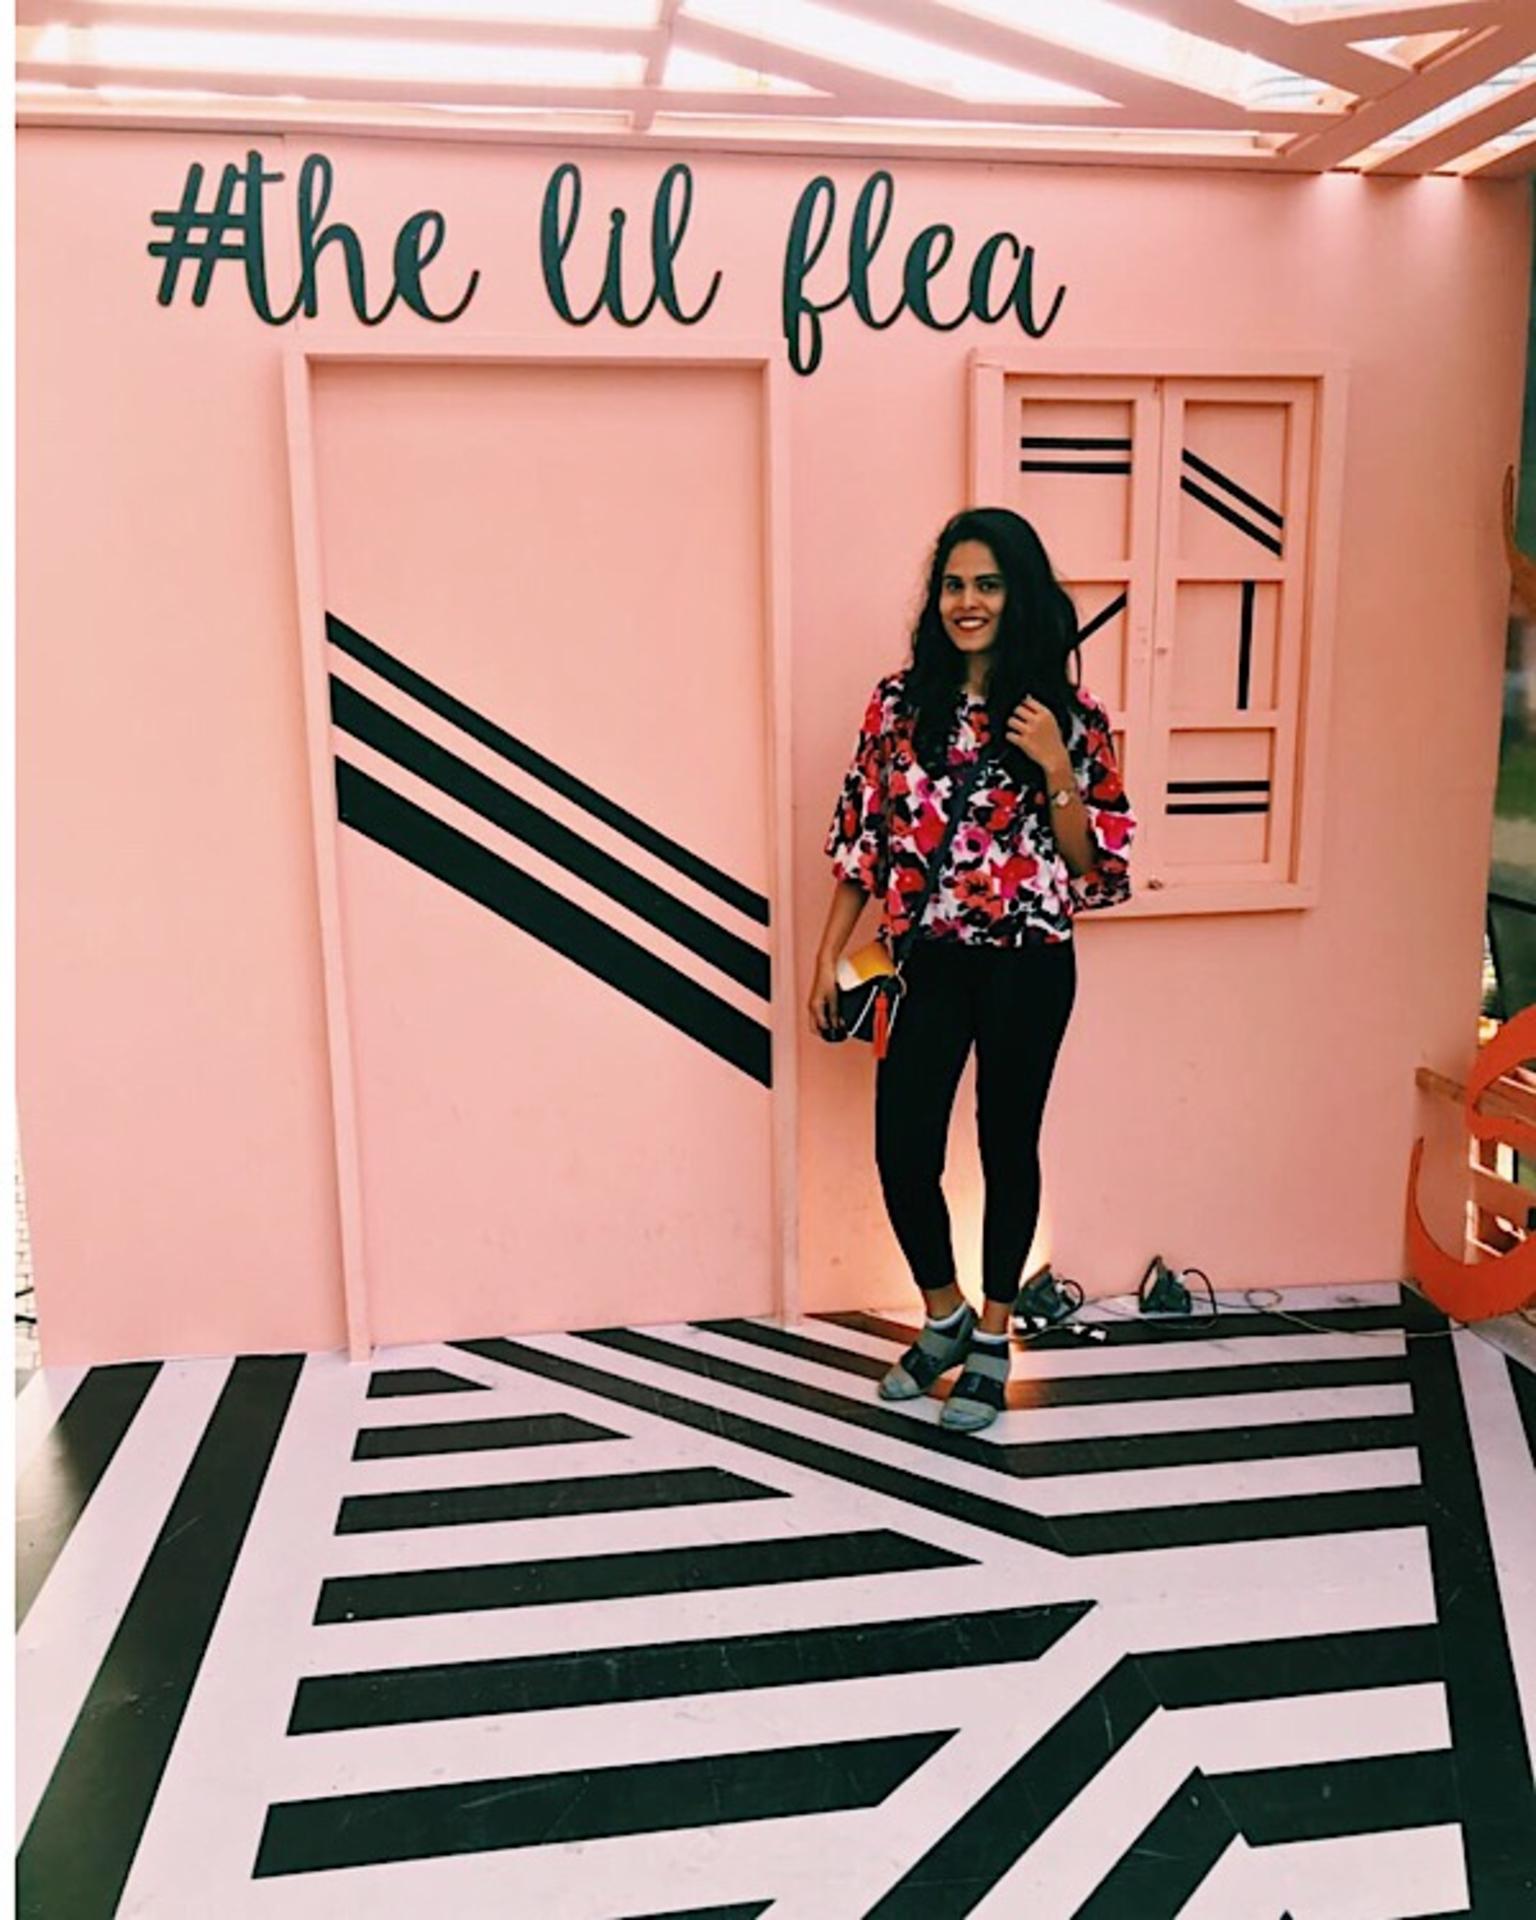 THE GLAM NUT - Fashion & Lifestyle Blog - The lil flea 10